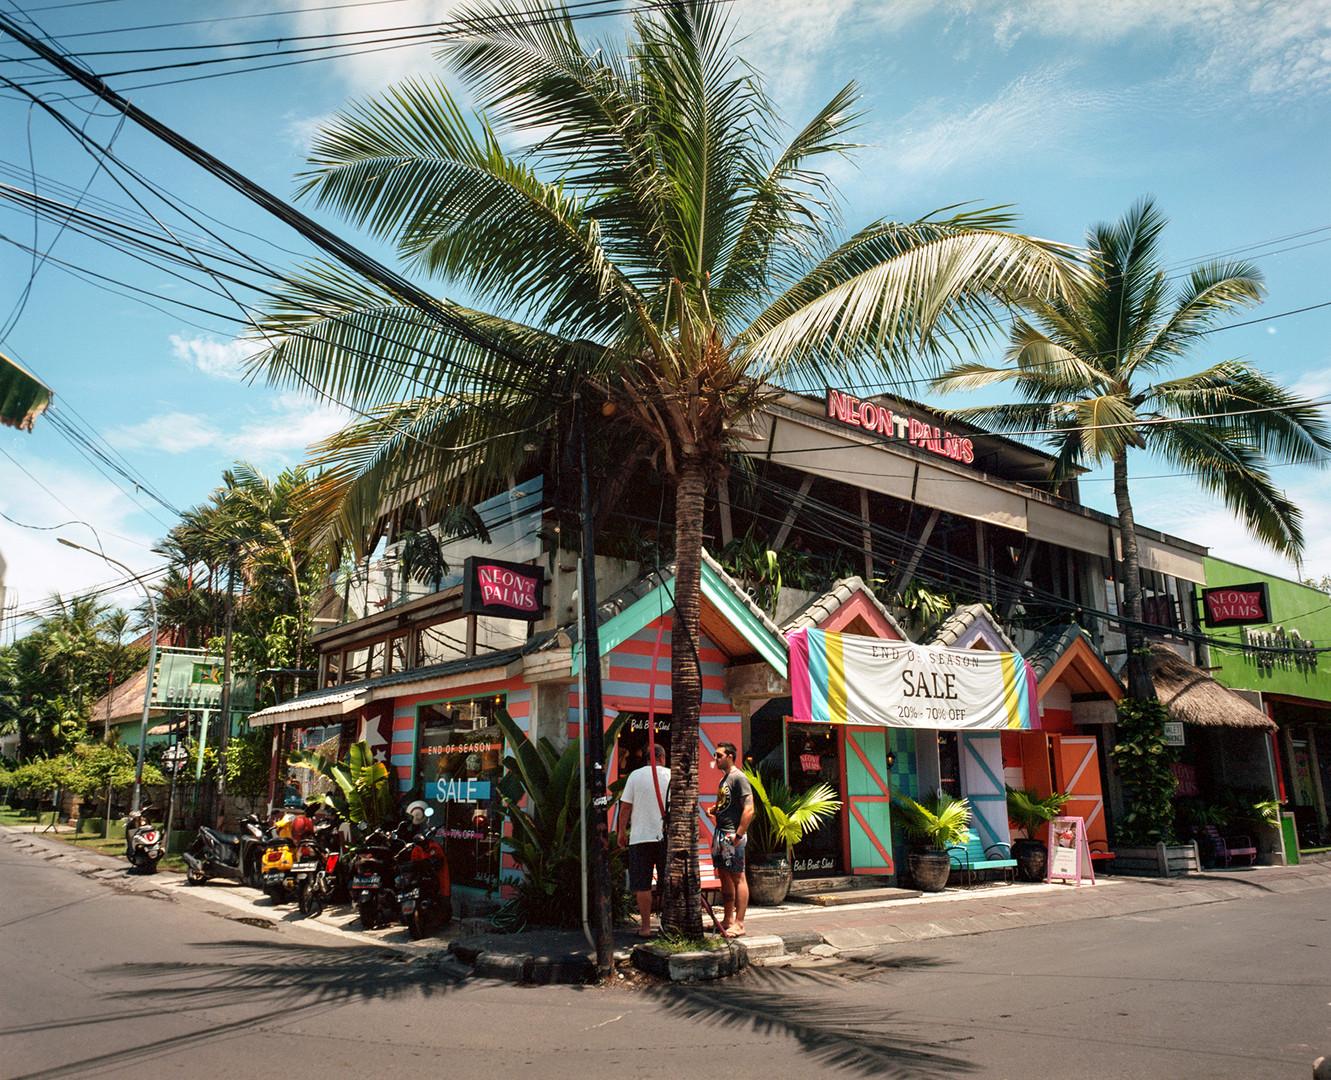 Goodman-zone-camera-shots-Bali-1.jpg